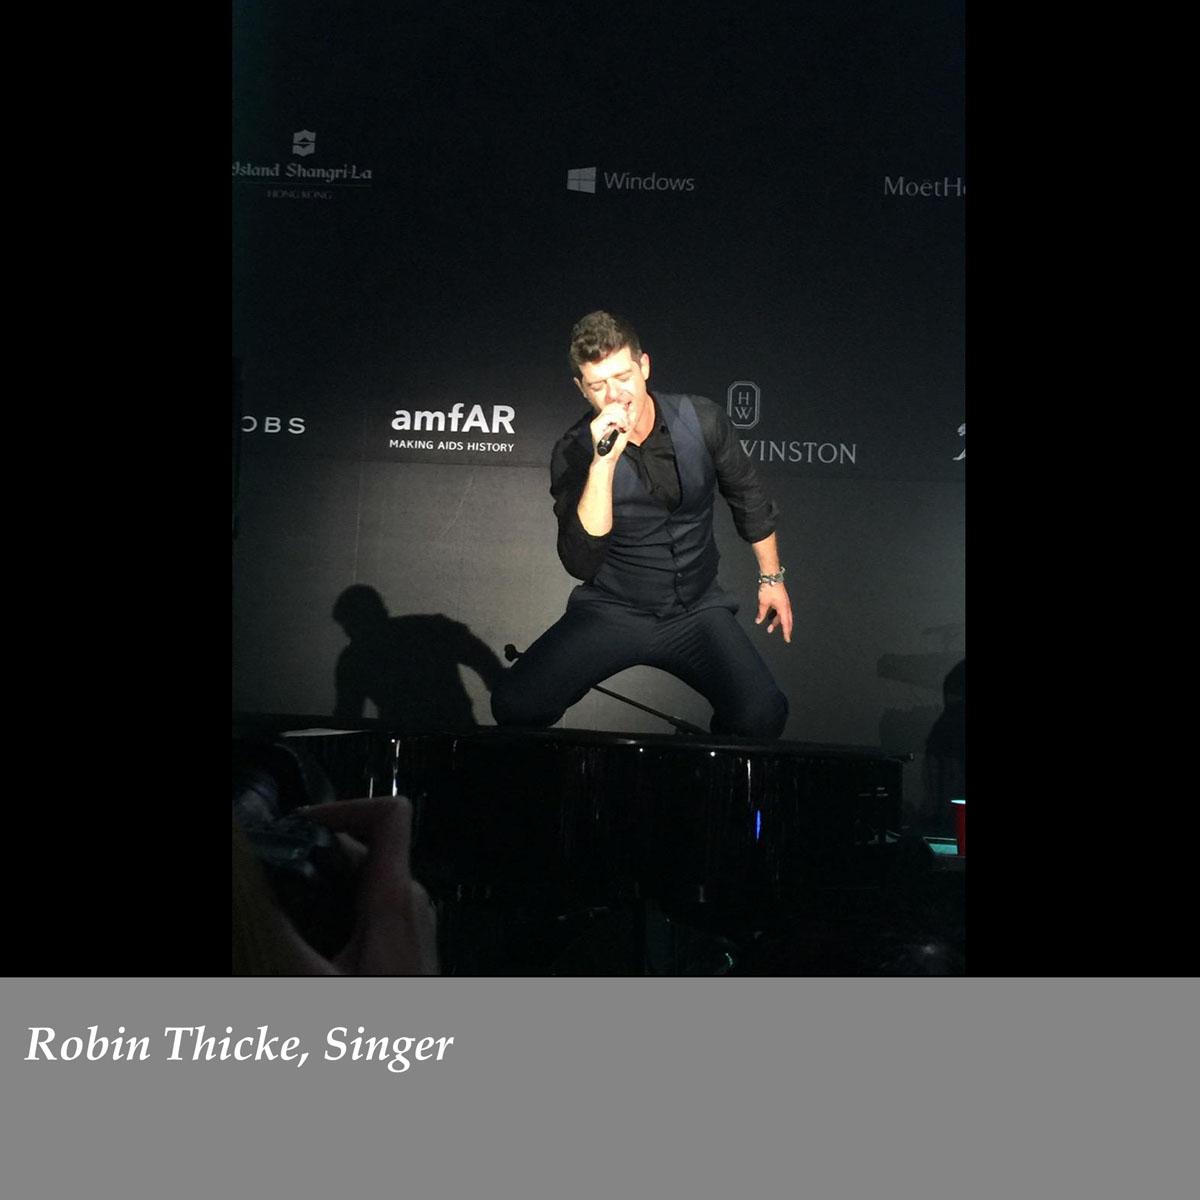 Robin-Thicke-Singer-2